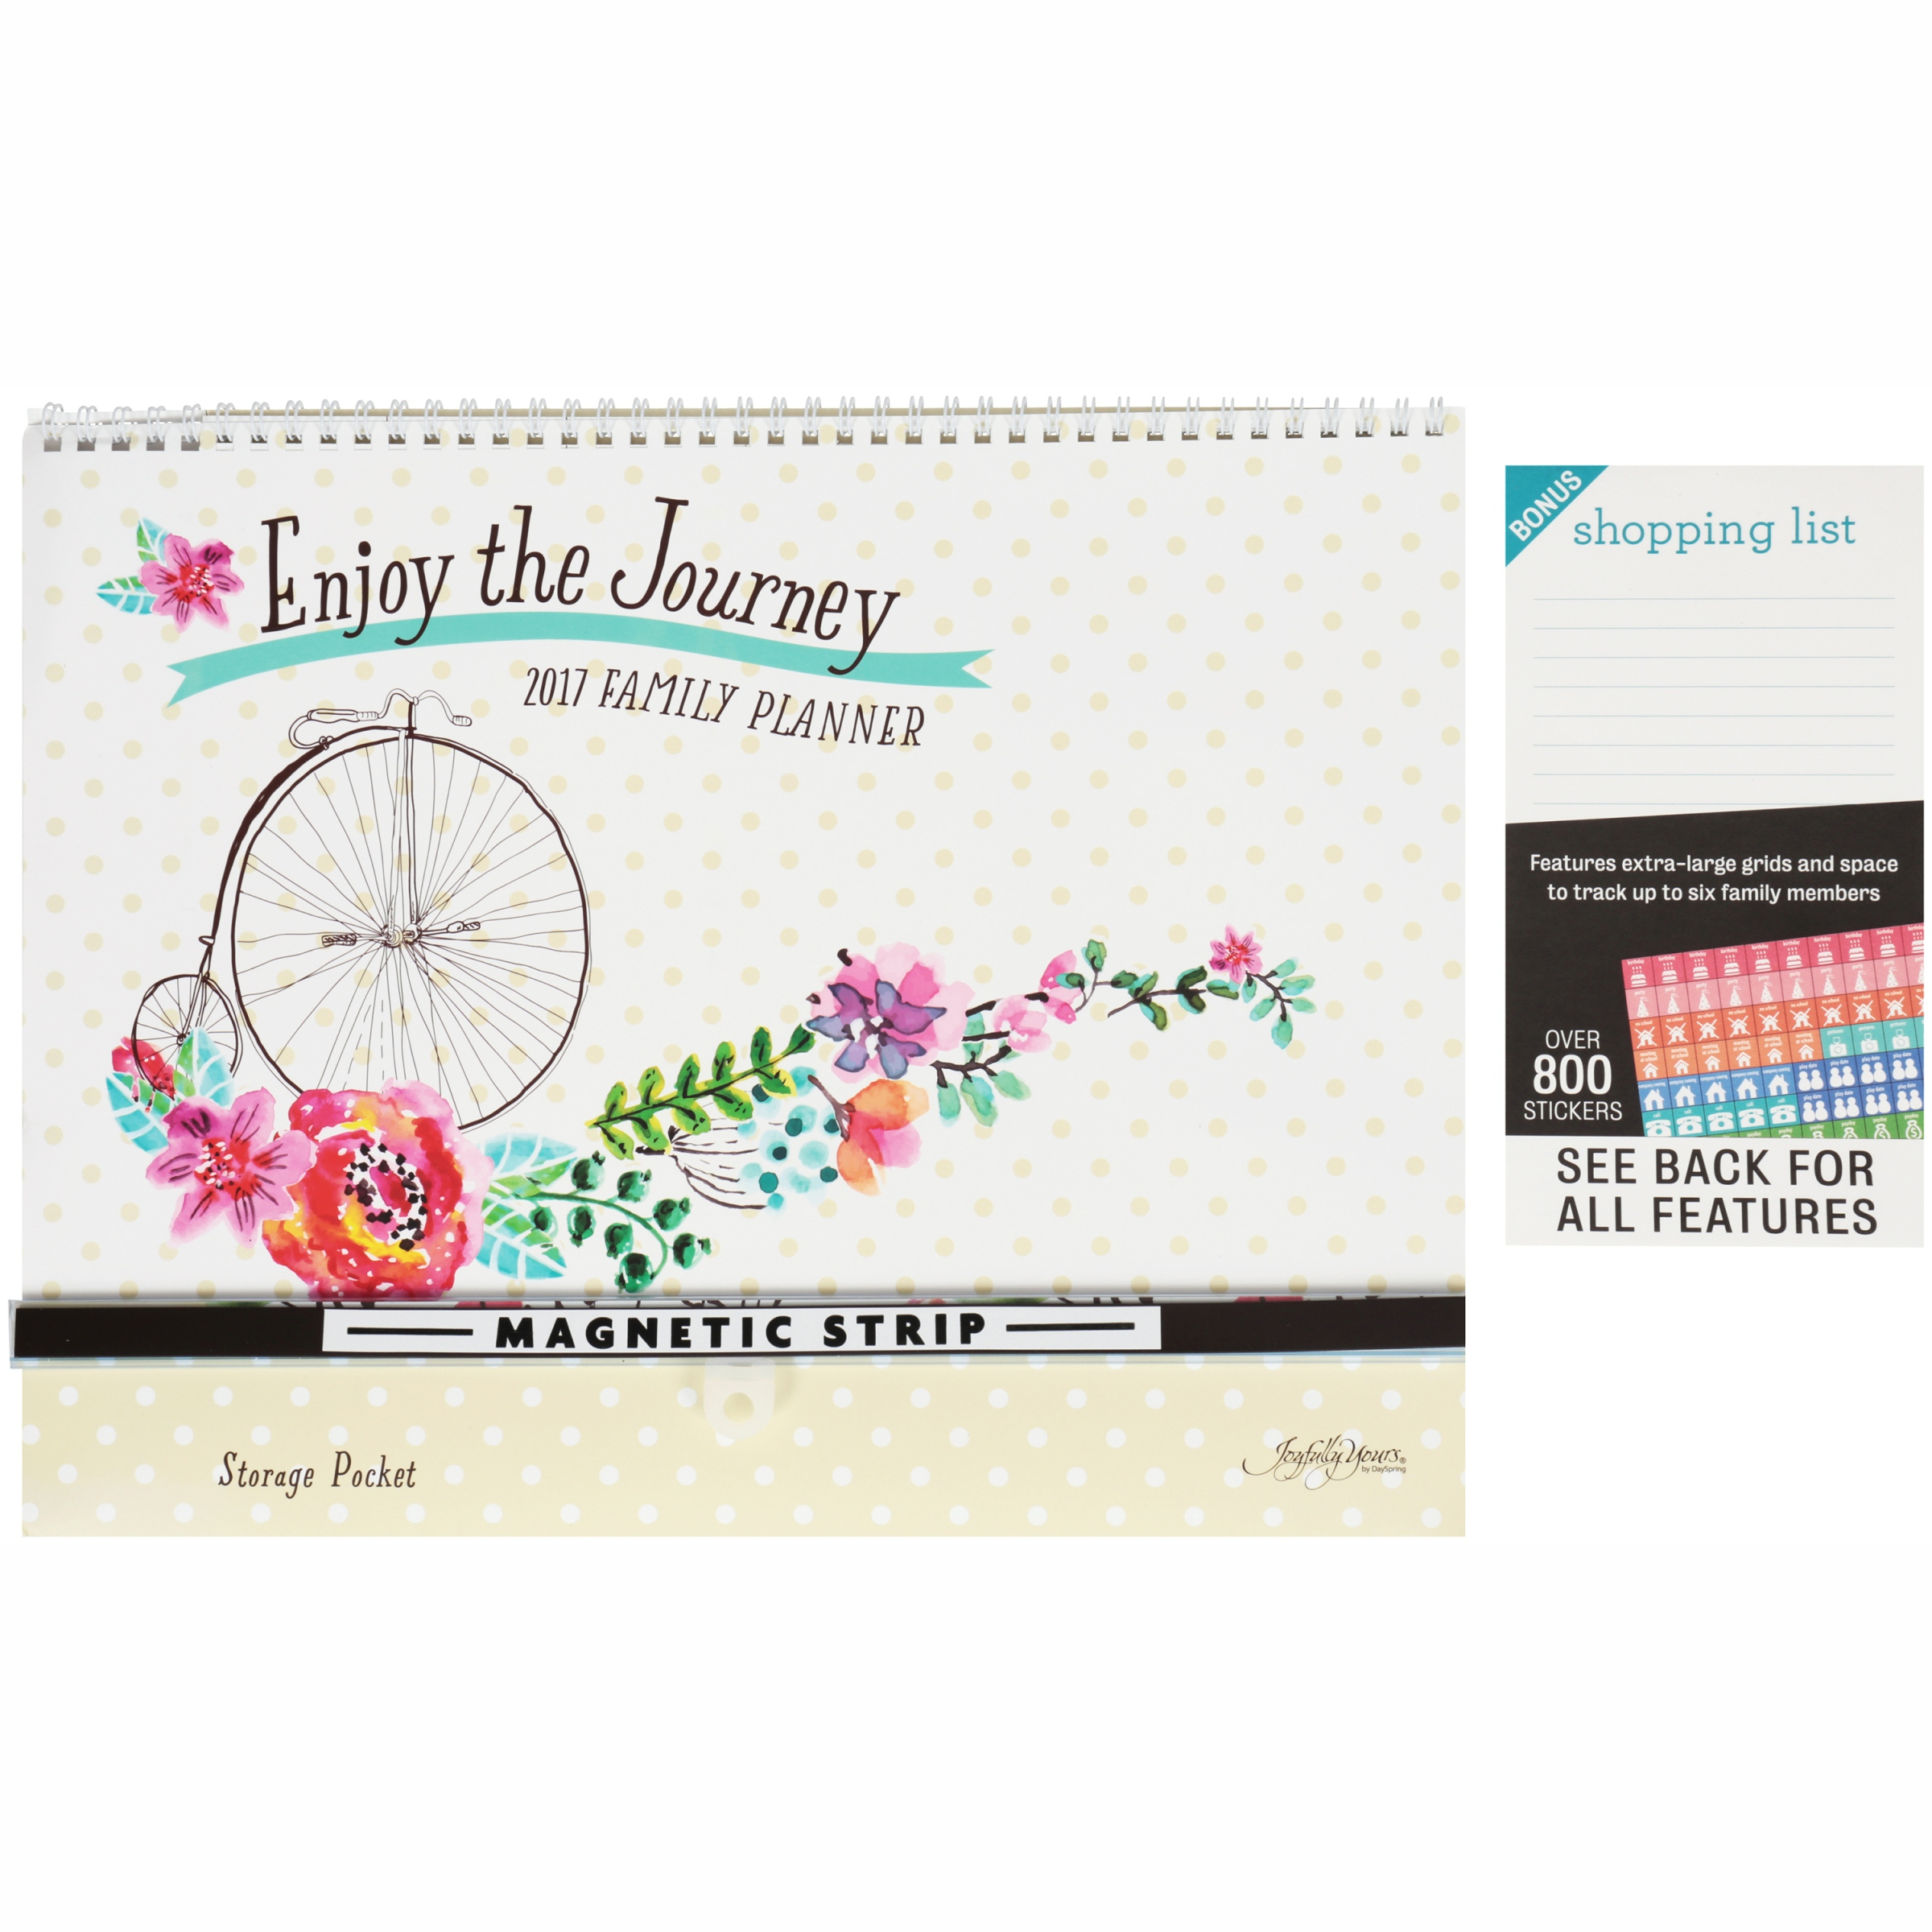 DaySpring Joyfully Yours® Enjoy the Journey 2017 Family Planner